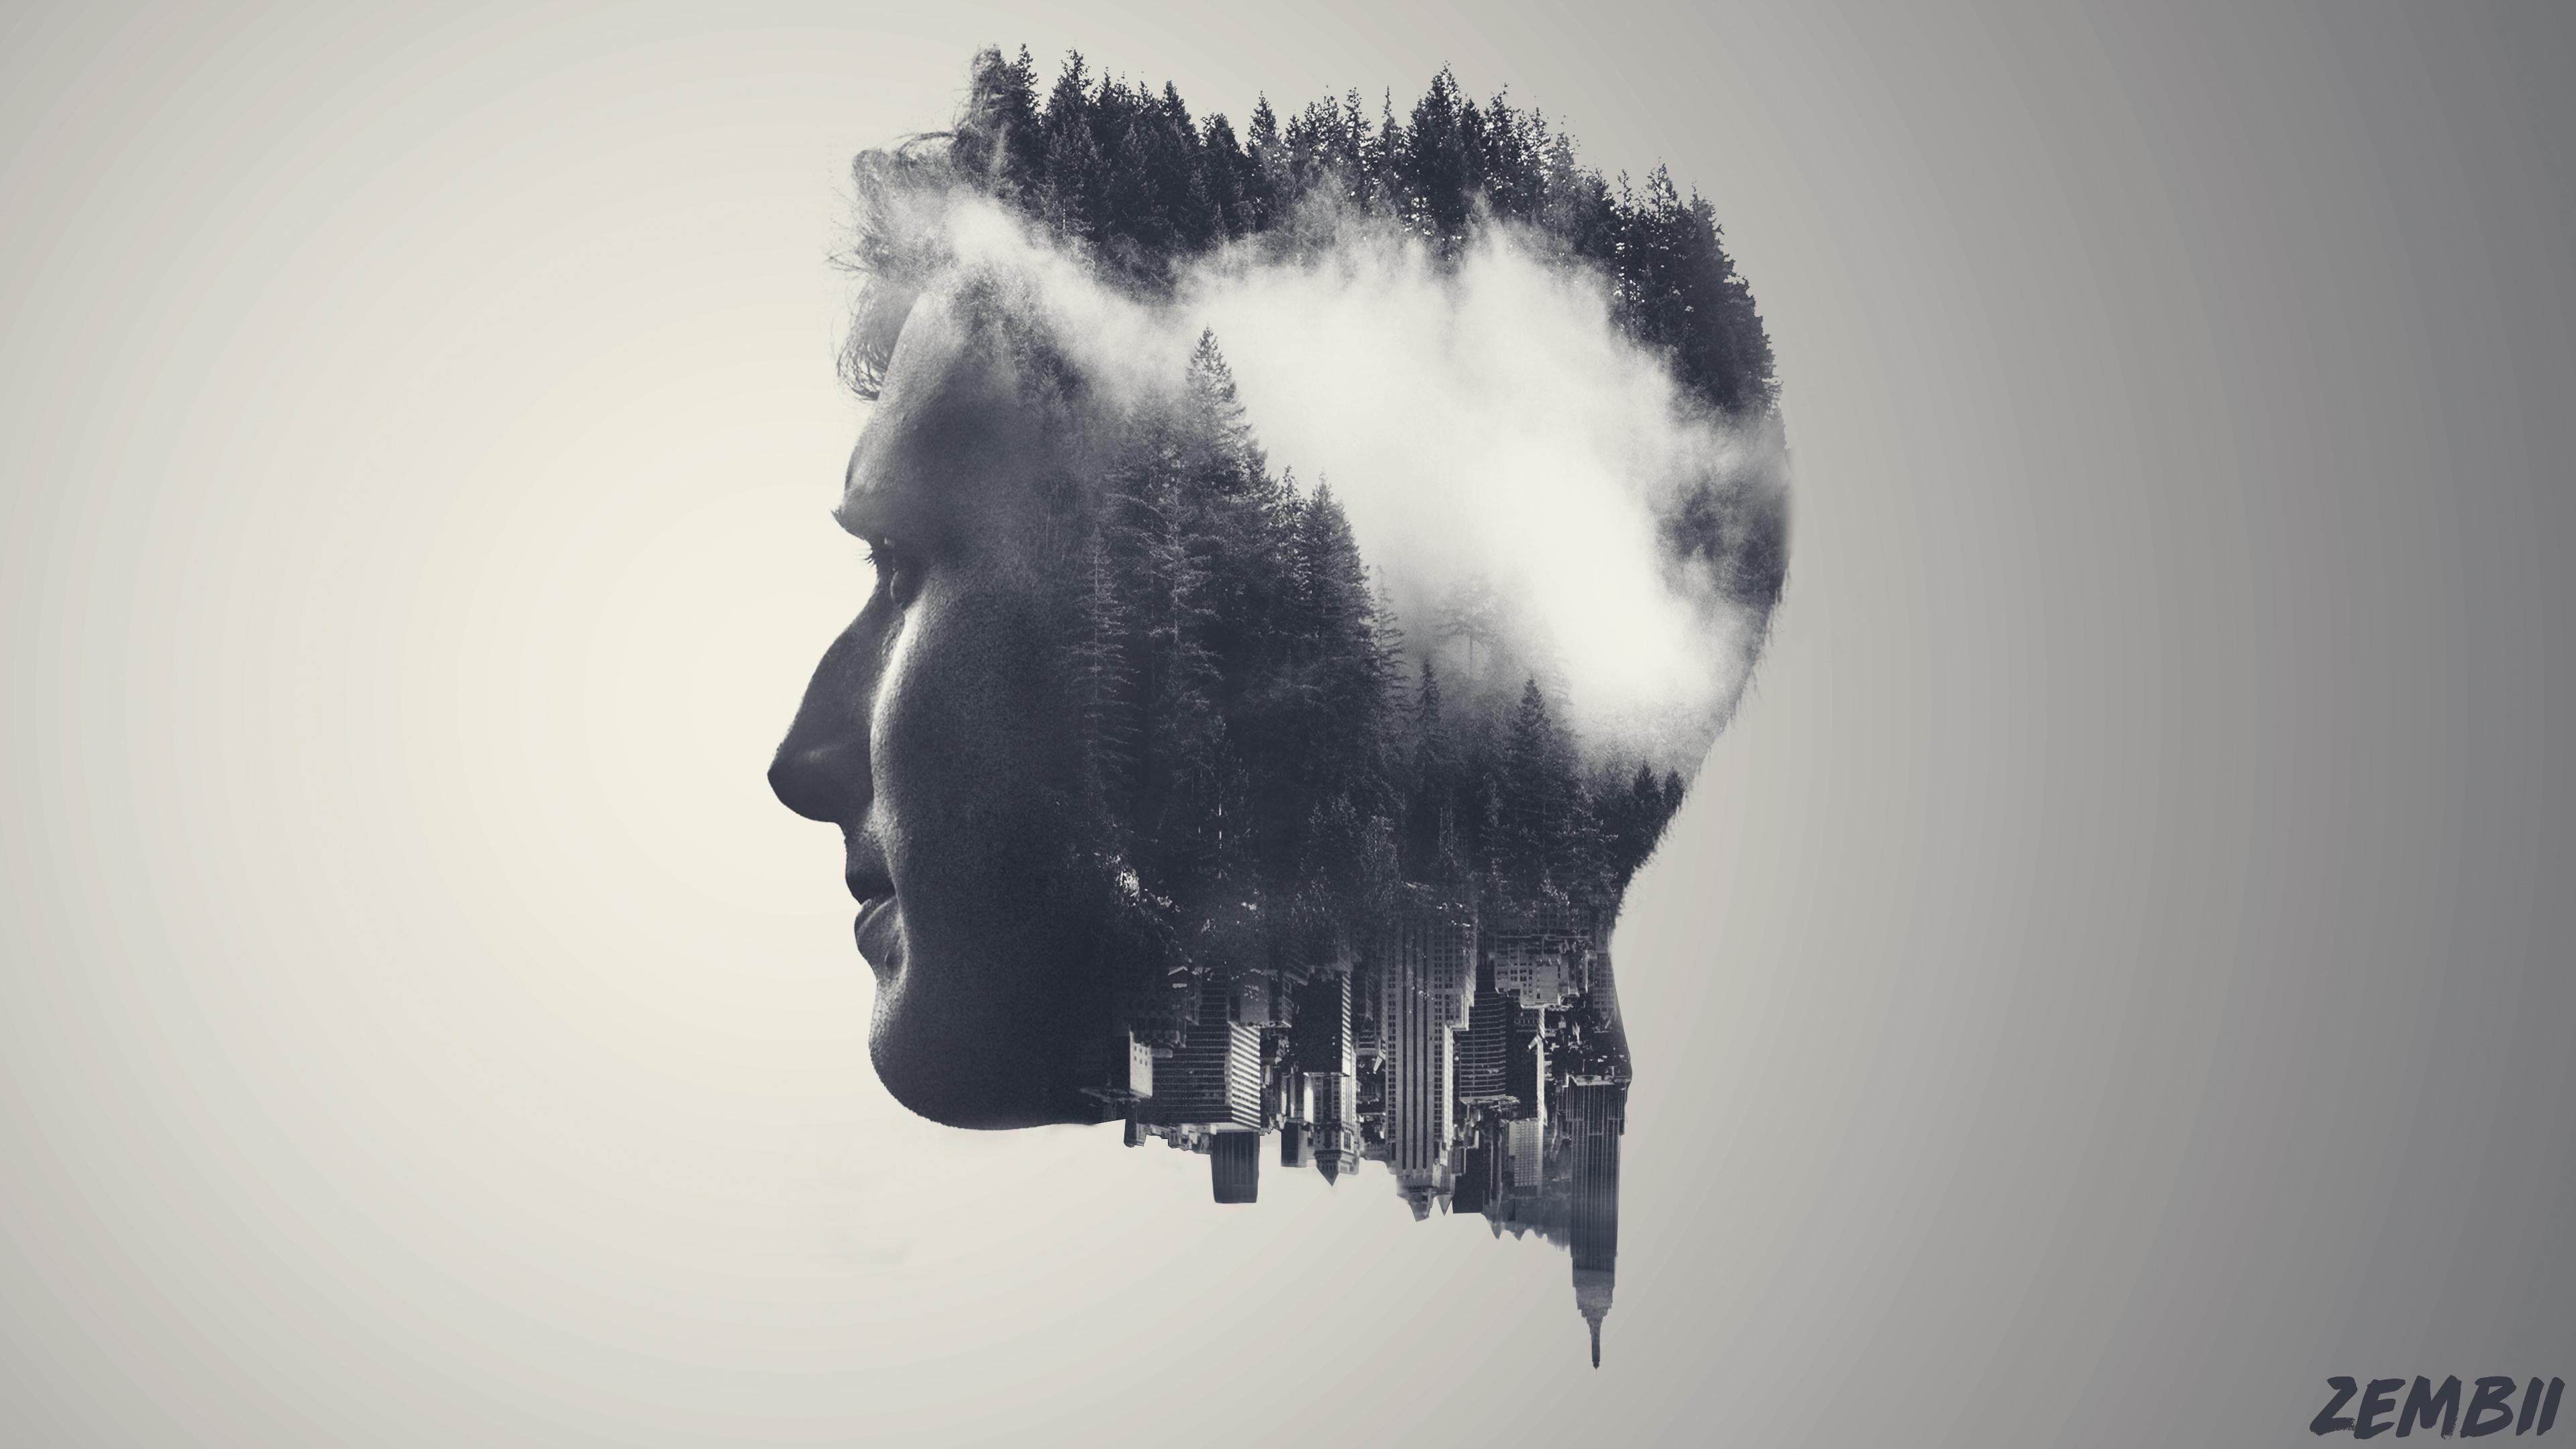 Artistic: Face, Man, Black & White, Double Exposure